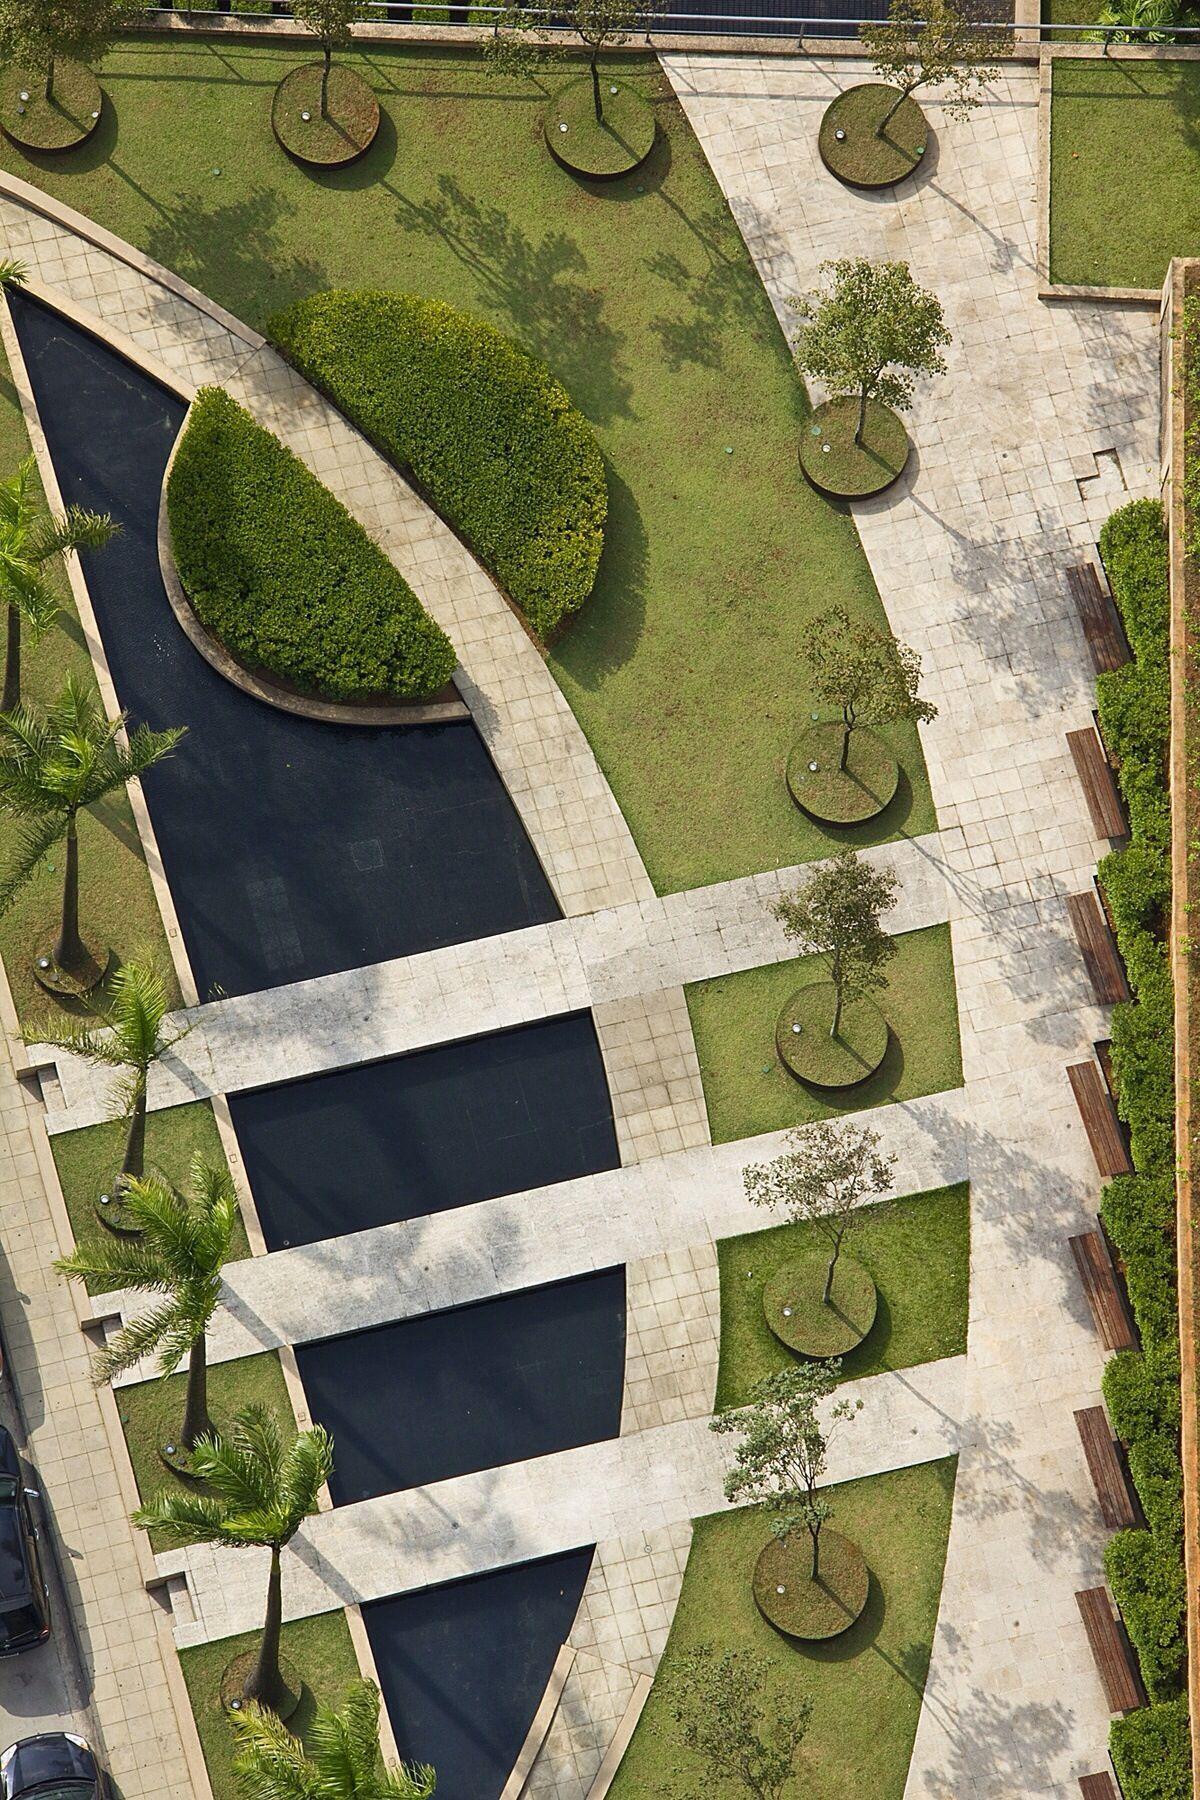 22 Landscape Garden Architecture Vintagetopia Urban